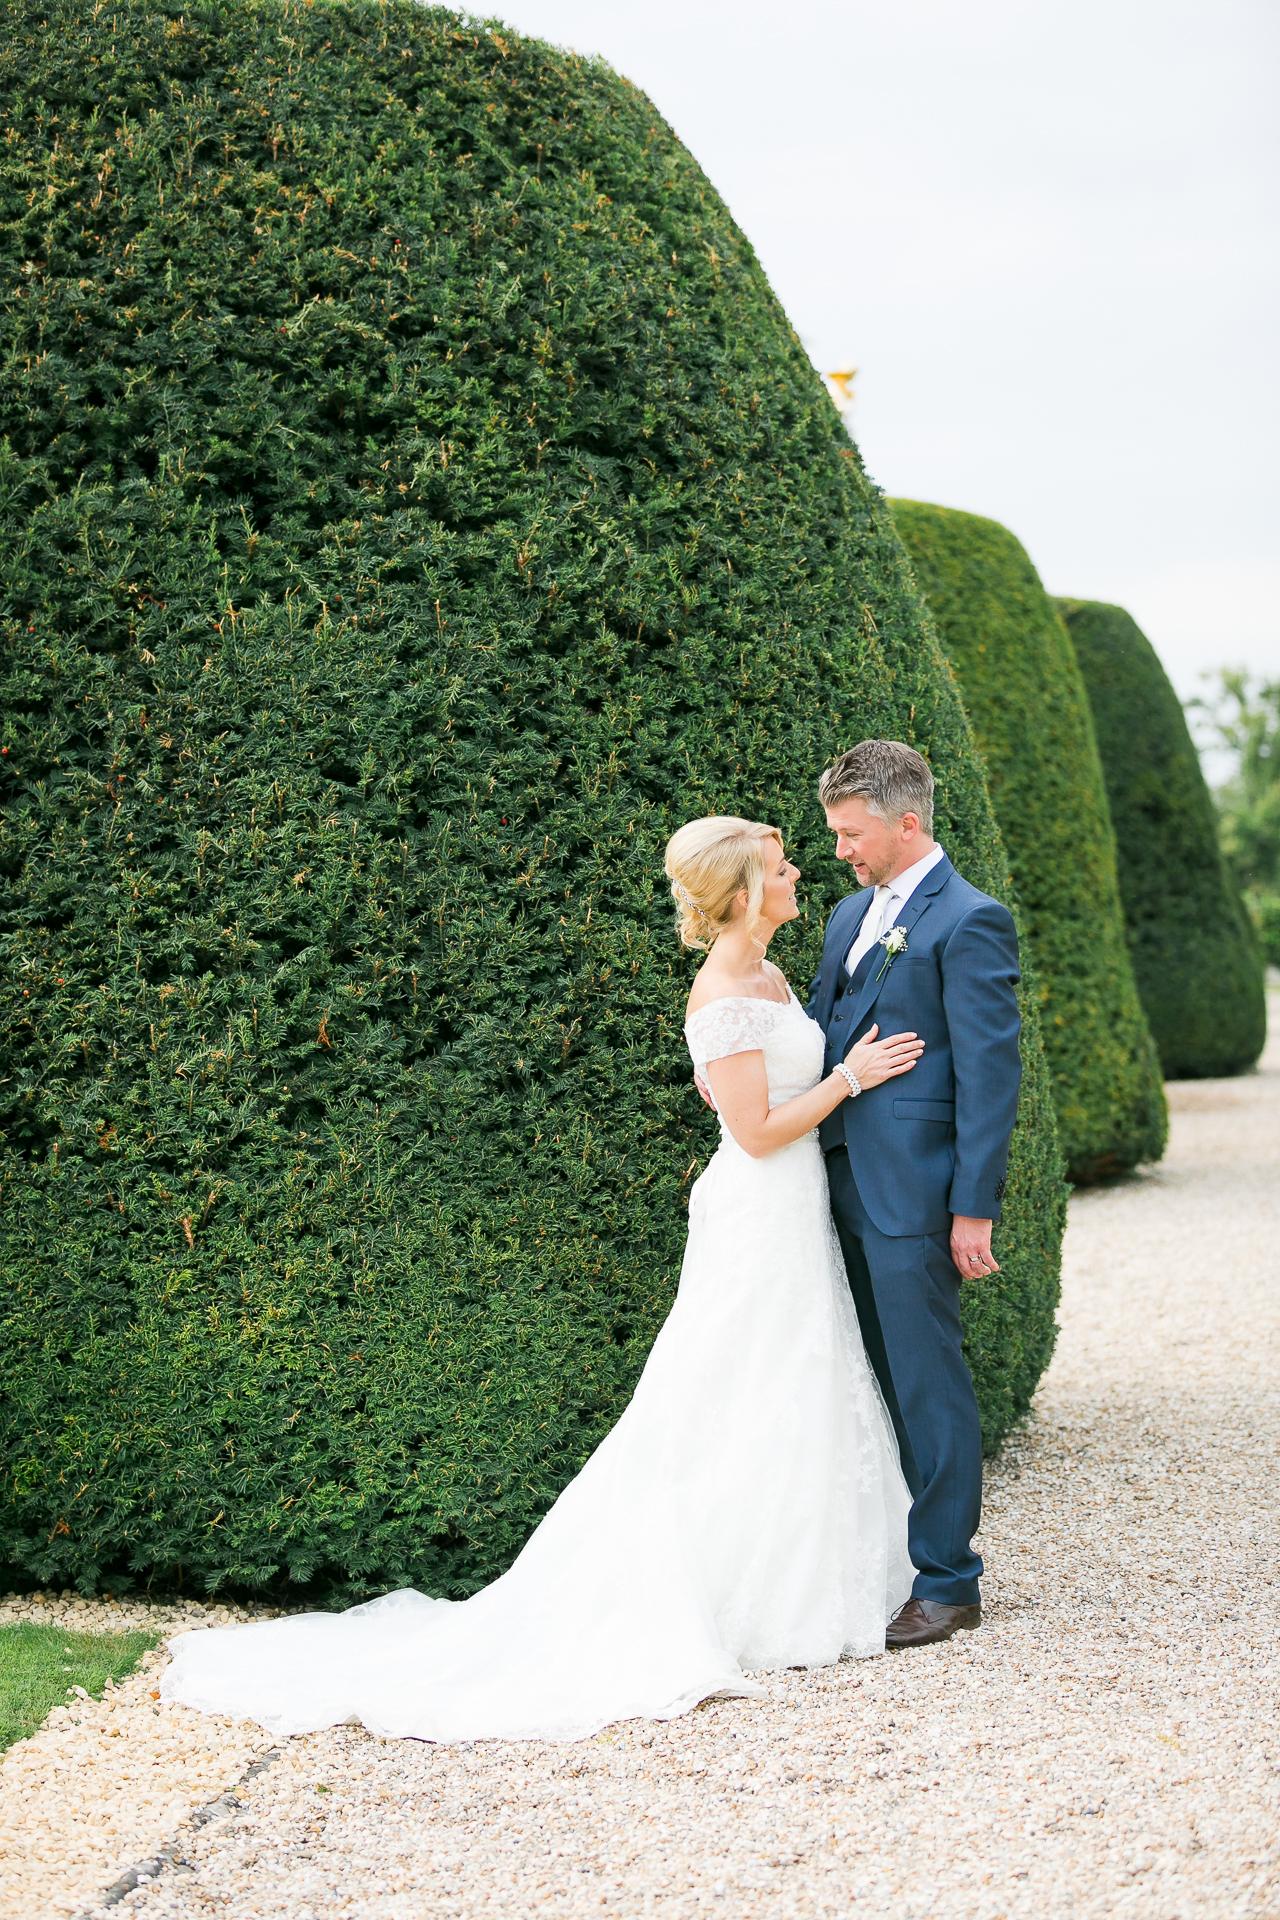 20140913-Andrea&John-362-Andrea & John-Chateau Ipmney-Wedding-Staffordshire-photo.jpg